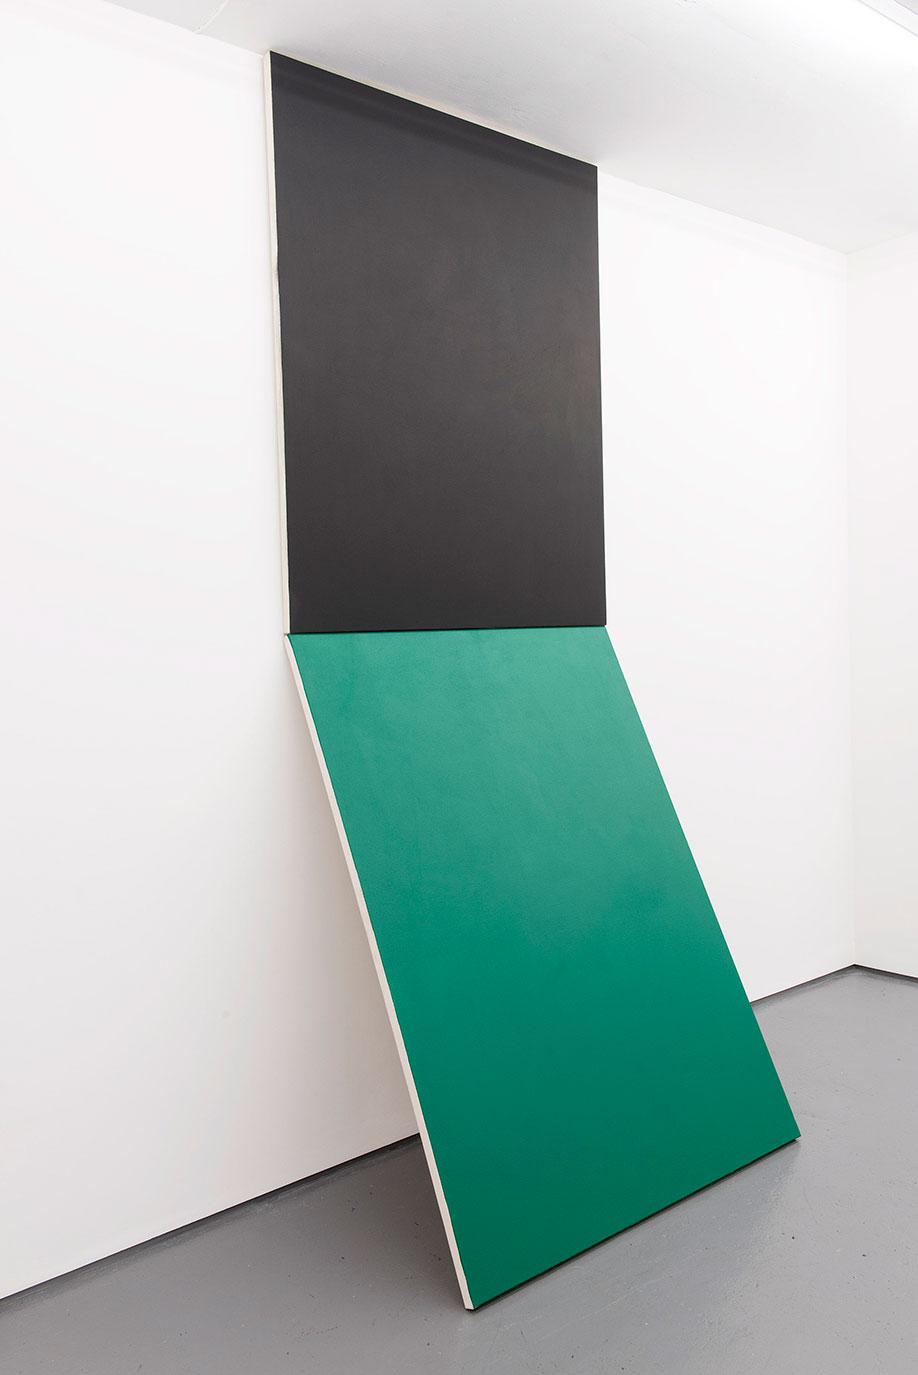 <b>Title:</b>Right This Way<br /><b>Year:</b>2016<br /><b>Medium:</b>Oil and acrylic on canvas<br /><b>Size:</b>300 x 122 cm